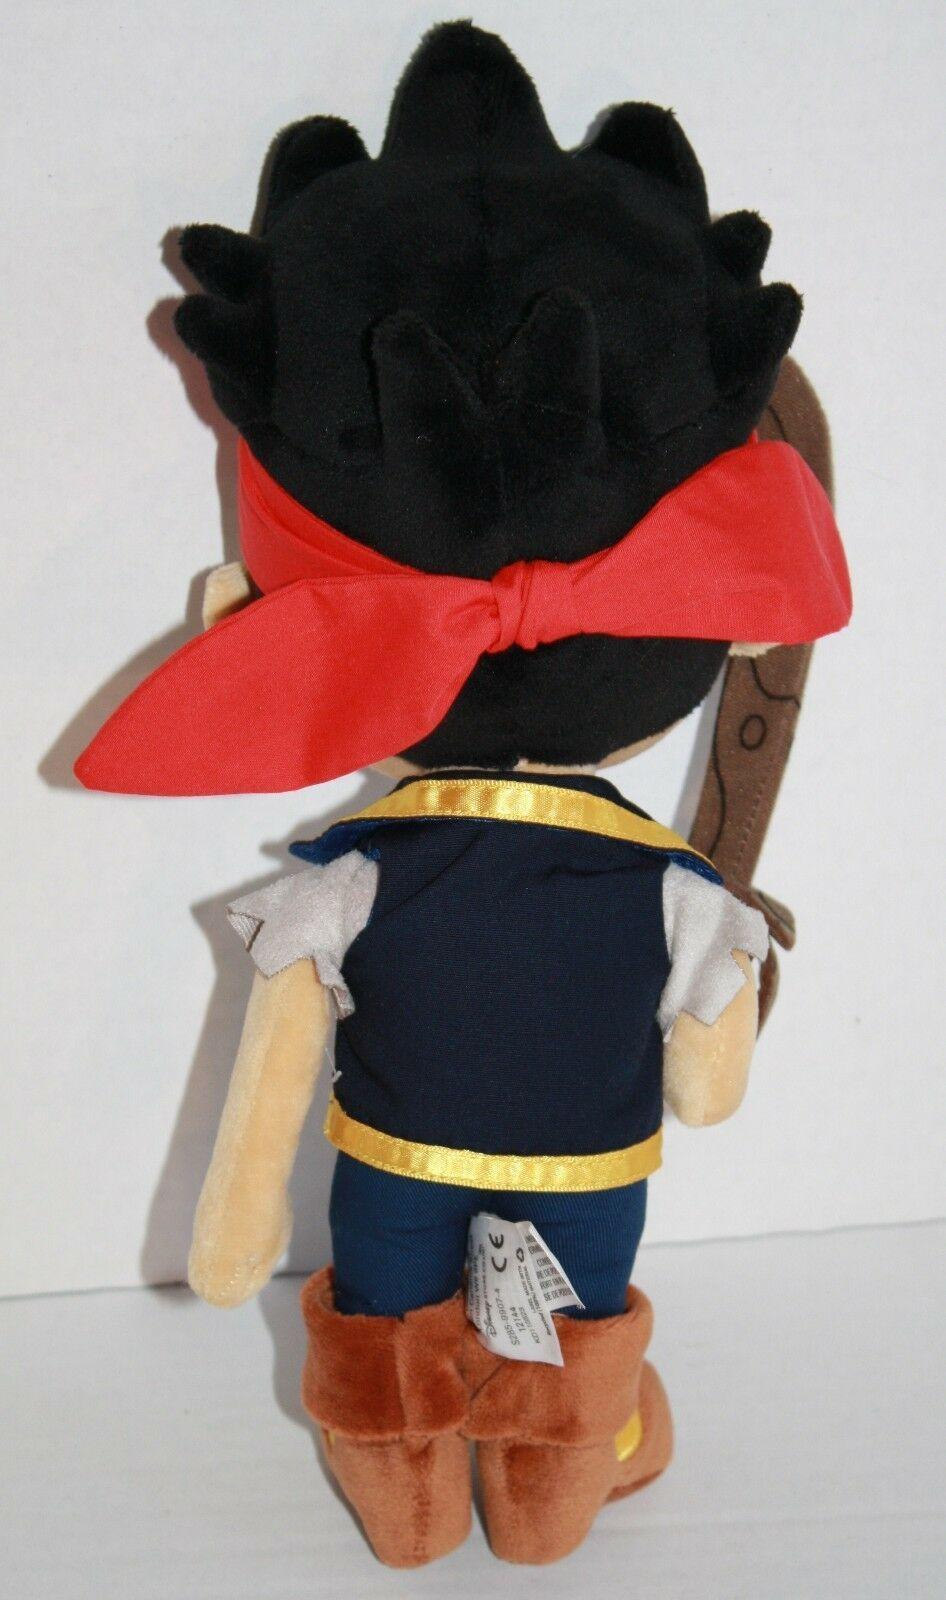 "JAKE AND THE NEVERLAND PIRATES 14"" Disney Store Plush Doll Stuffed Soft Toy"